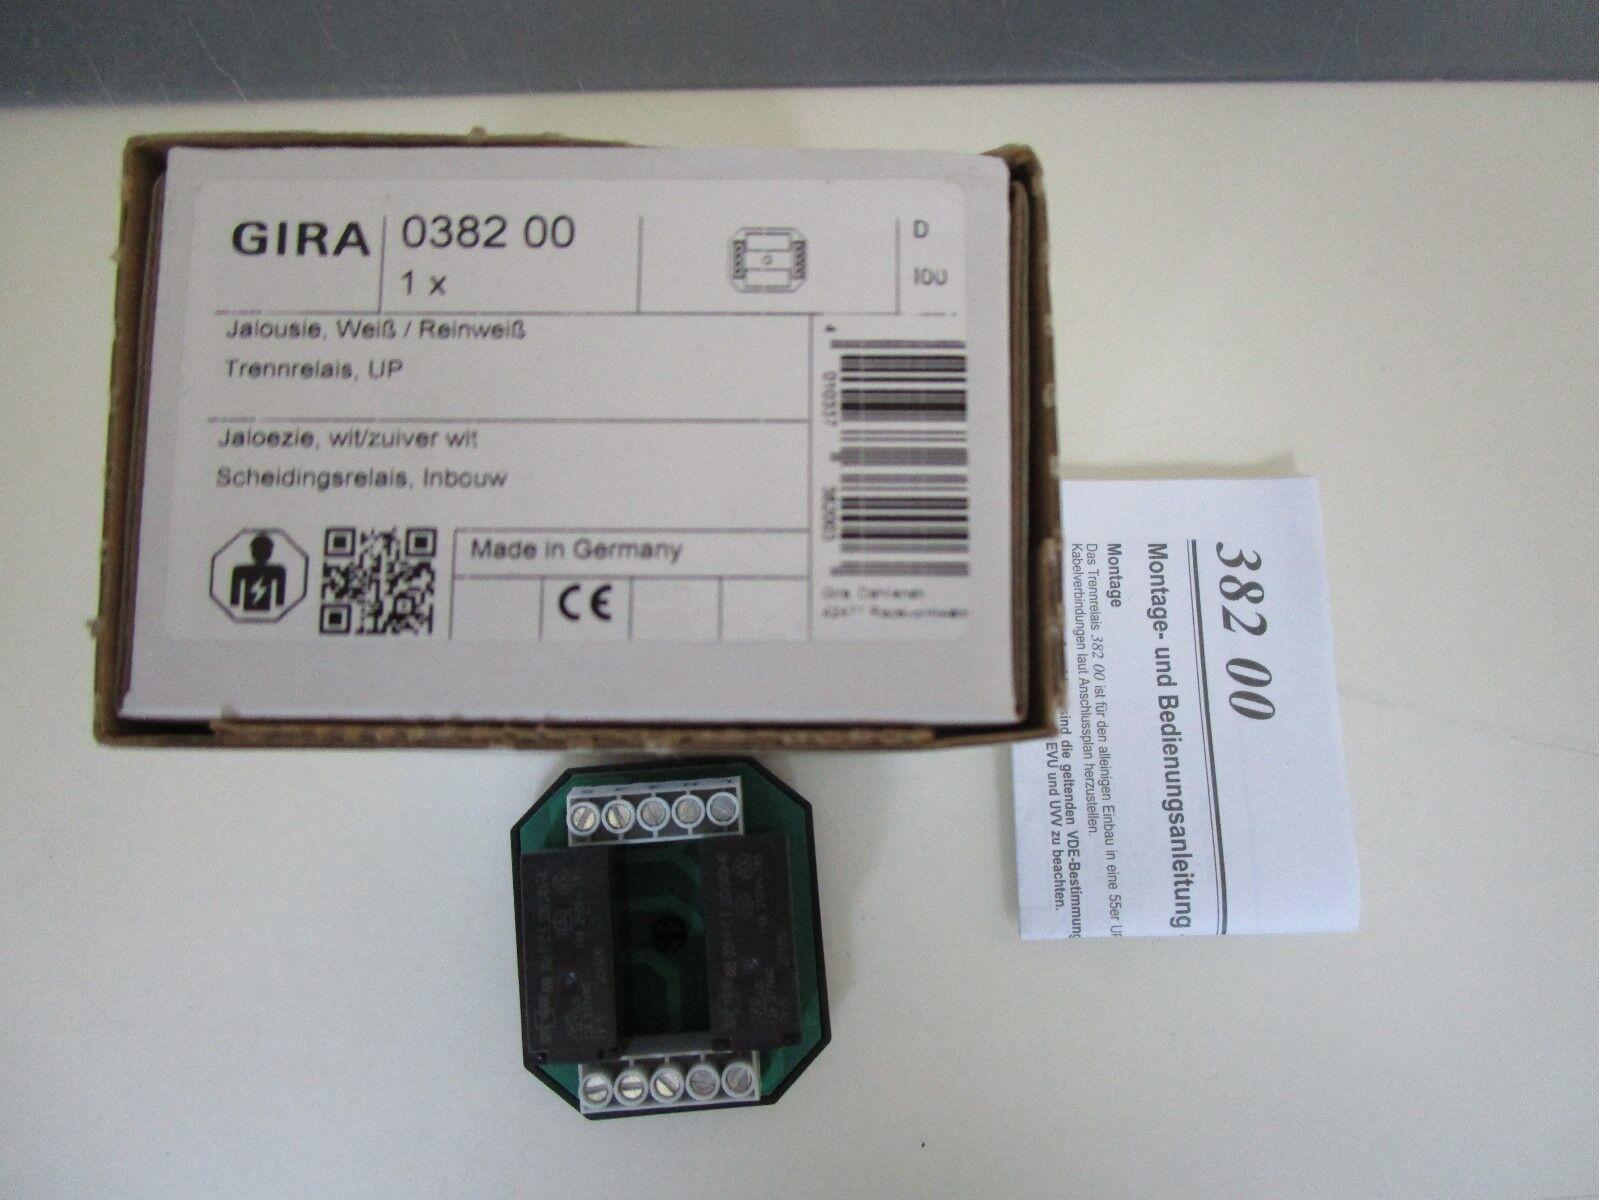 Gira 038200 Trennrelais Unterputz Jalousie  Neu OVP | Fairer Preis